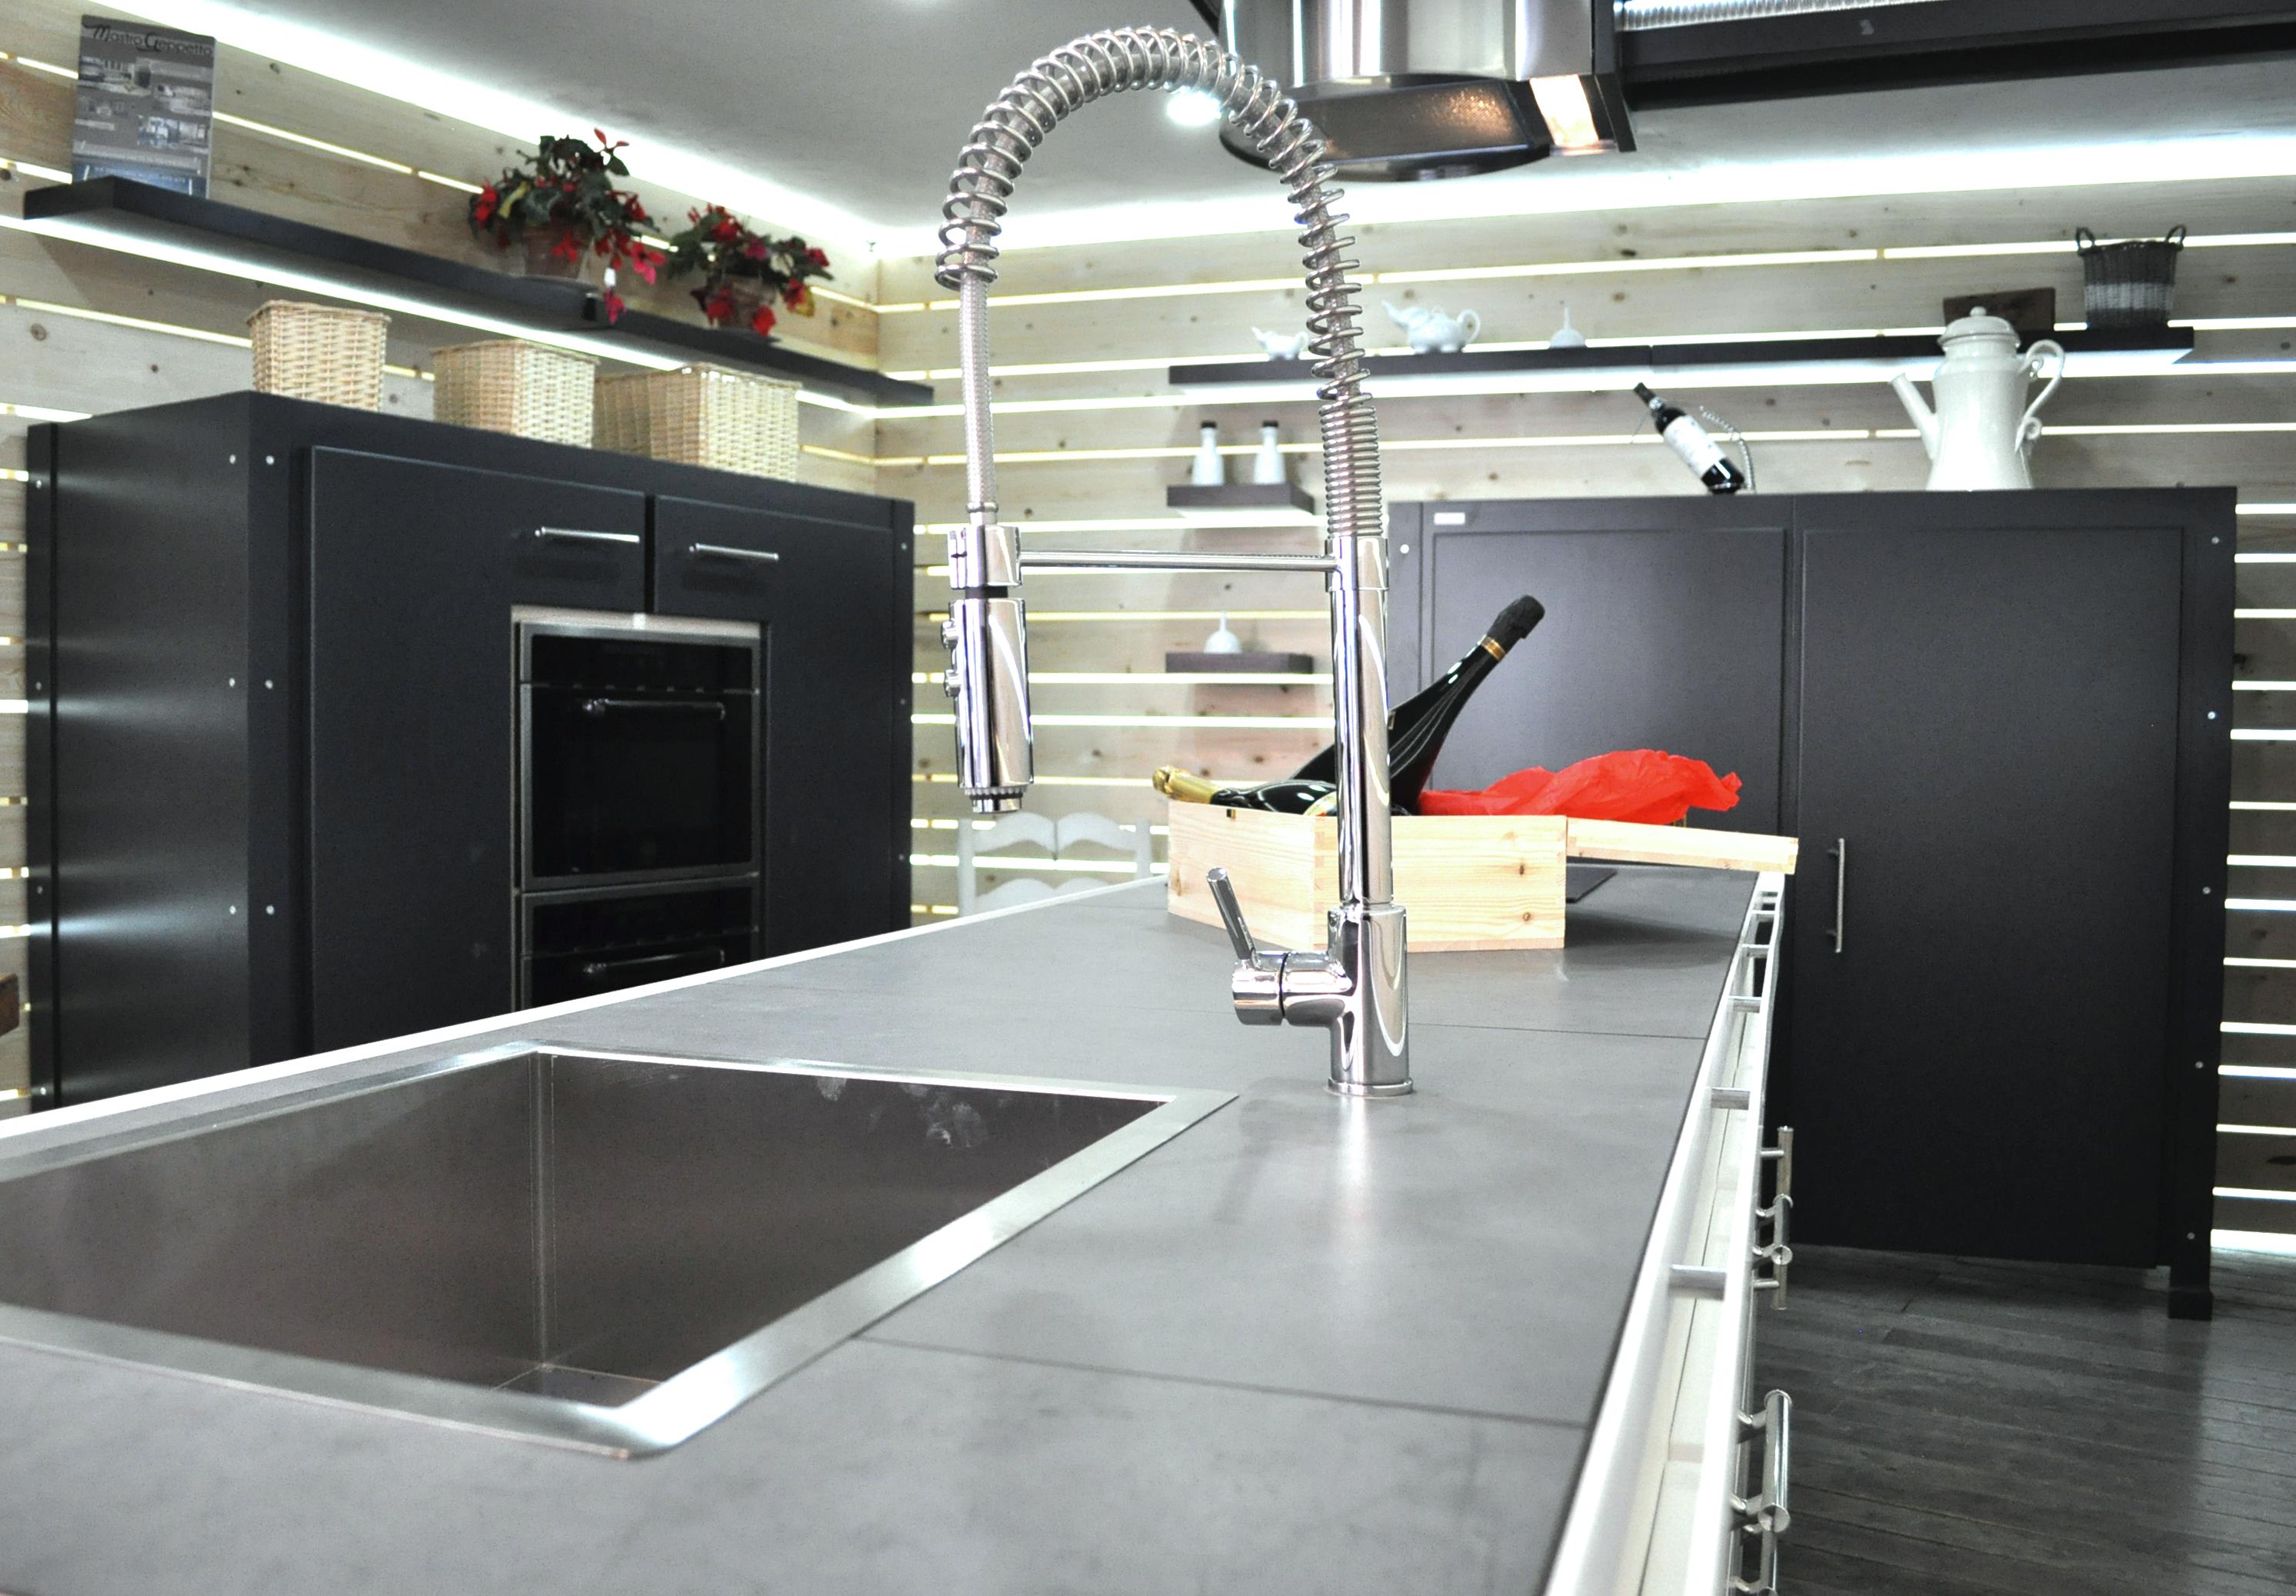 Cucina su misura Industrial-Falegnameria roma_4